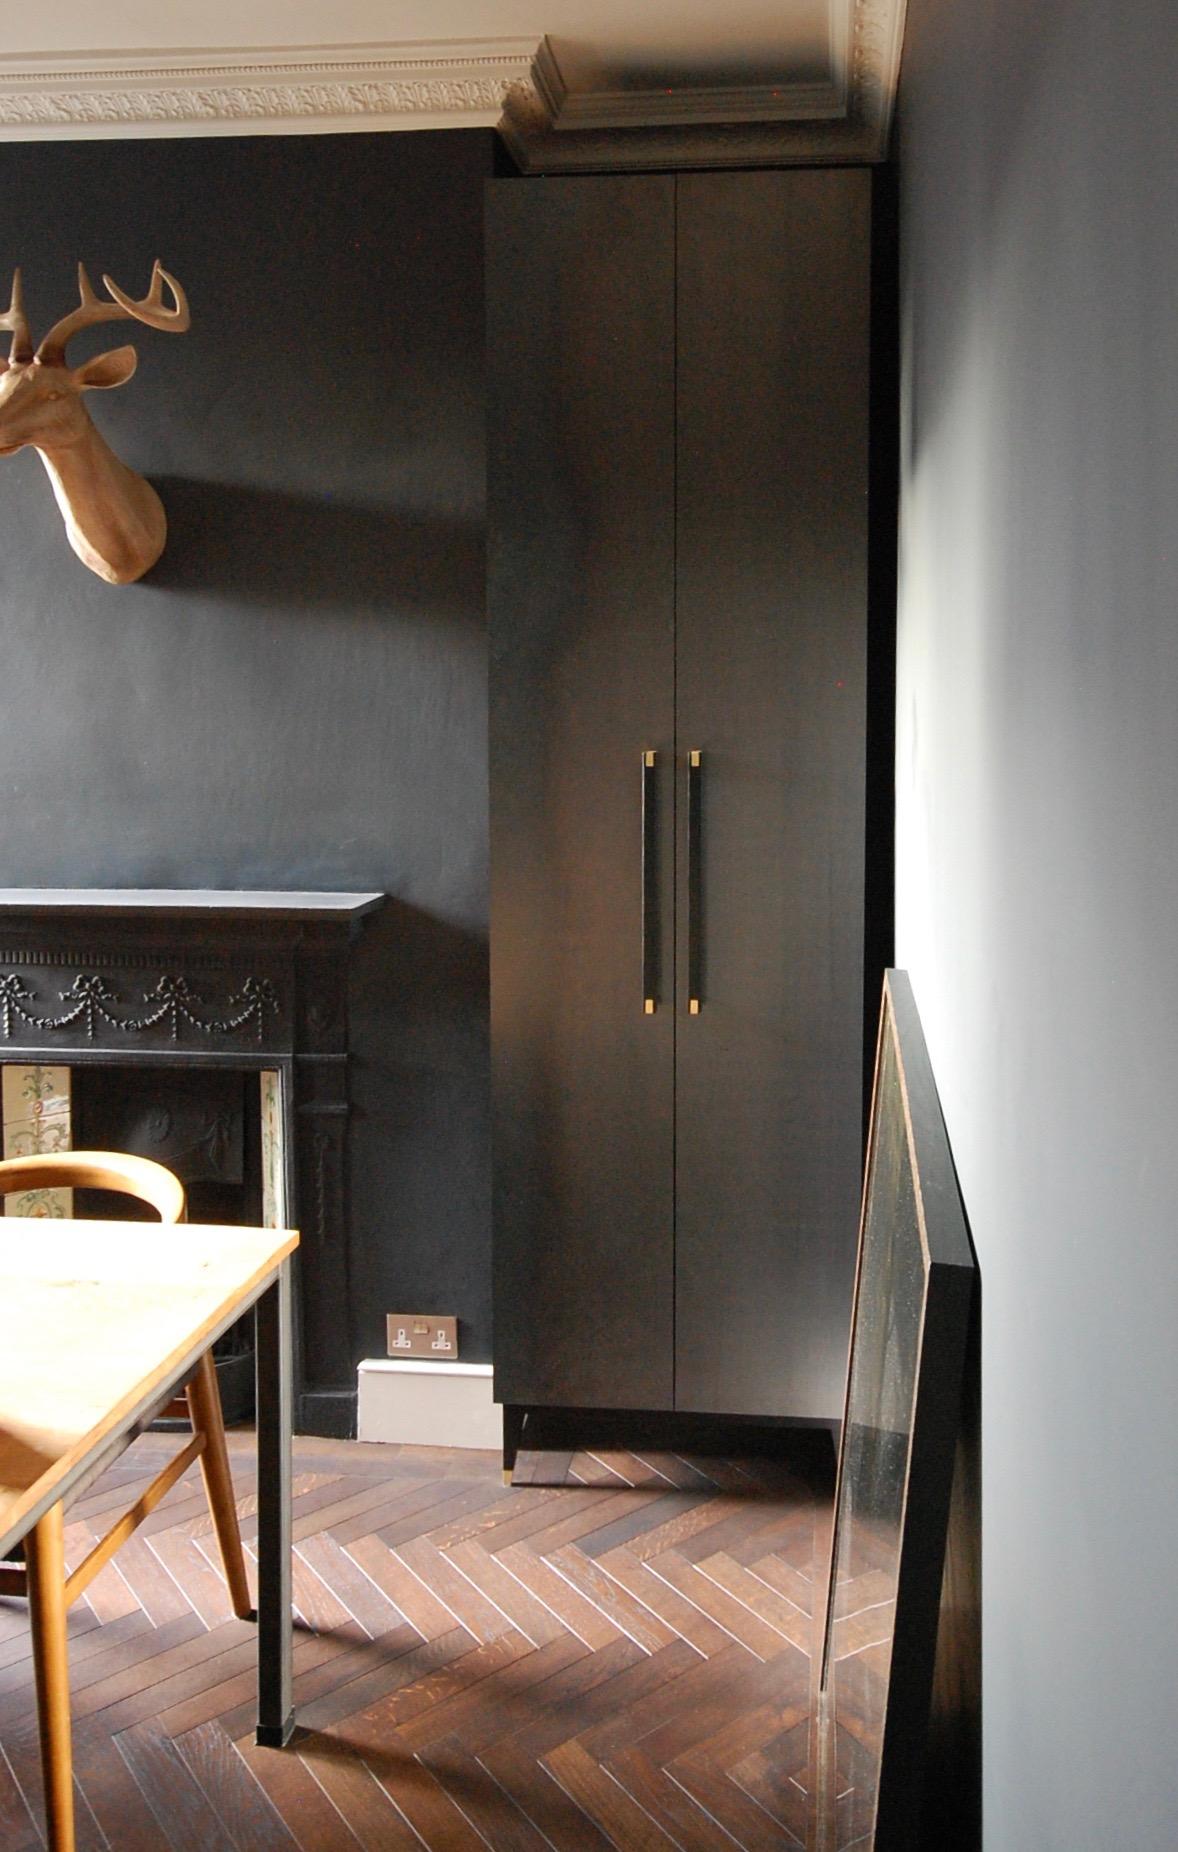 Grain_Bespoke_Furniture_Drinks_Cabinet_1.jpg